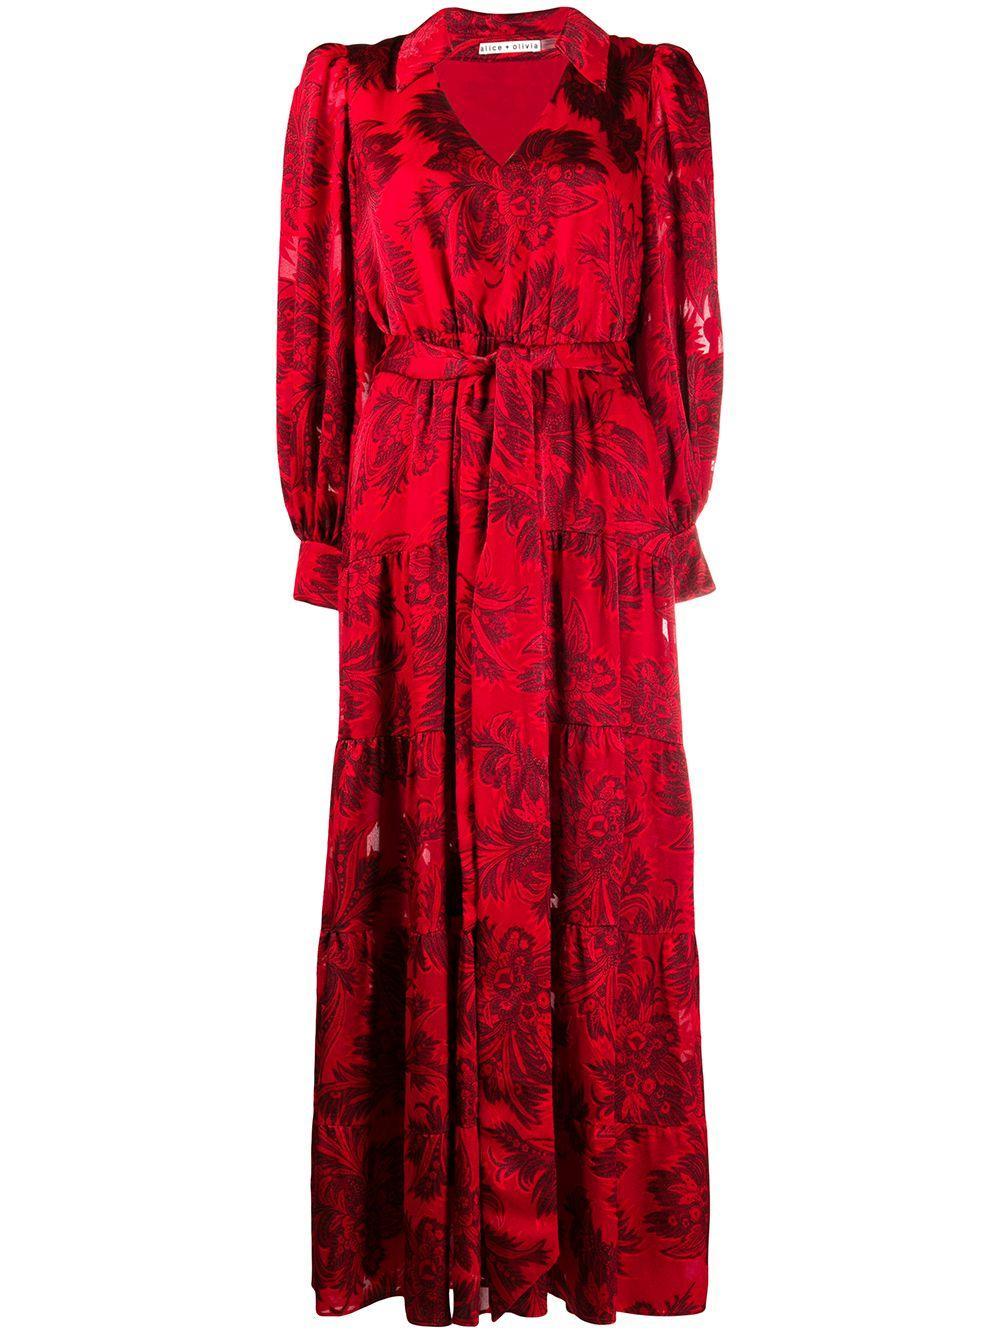 Sitara Maxi Dress